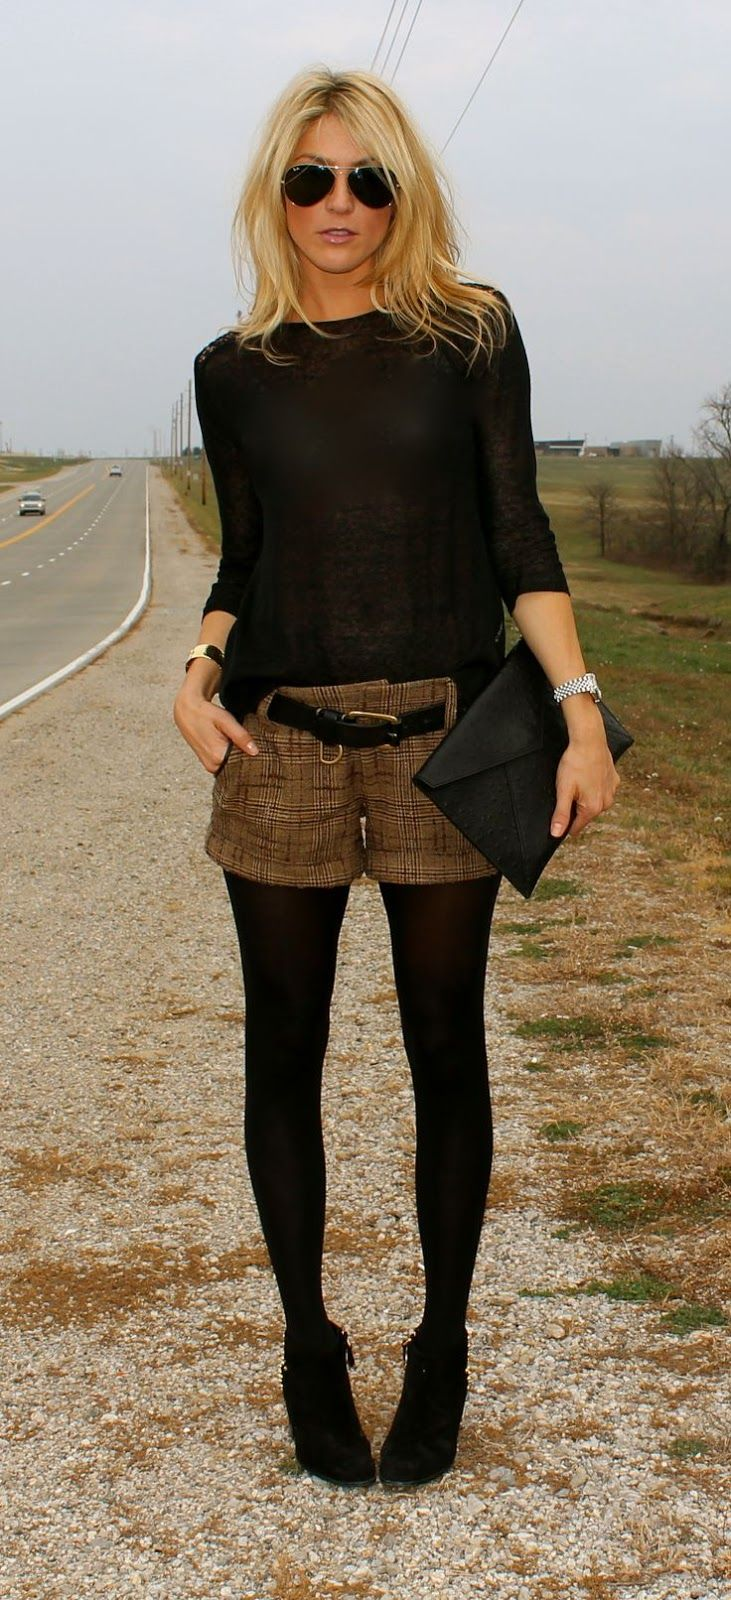 Street fashion black shirt, brown plaid shorts and tights